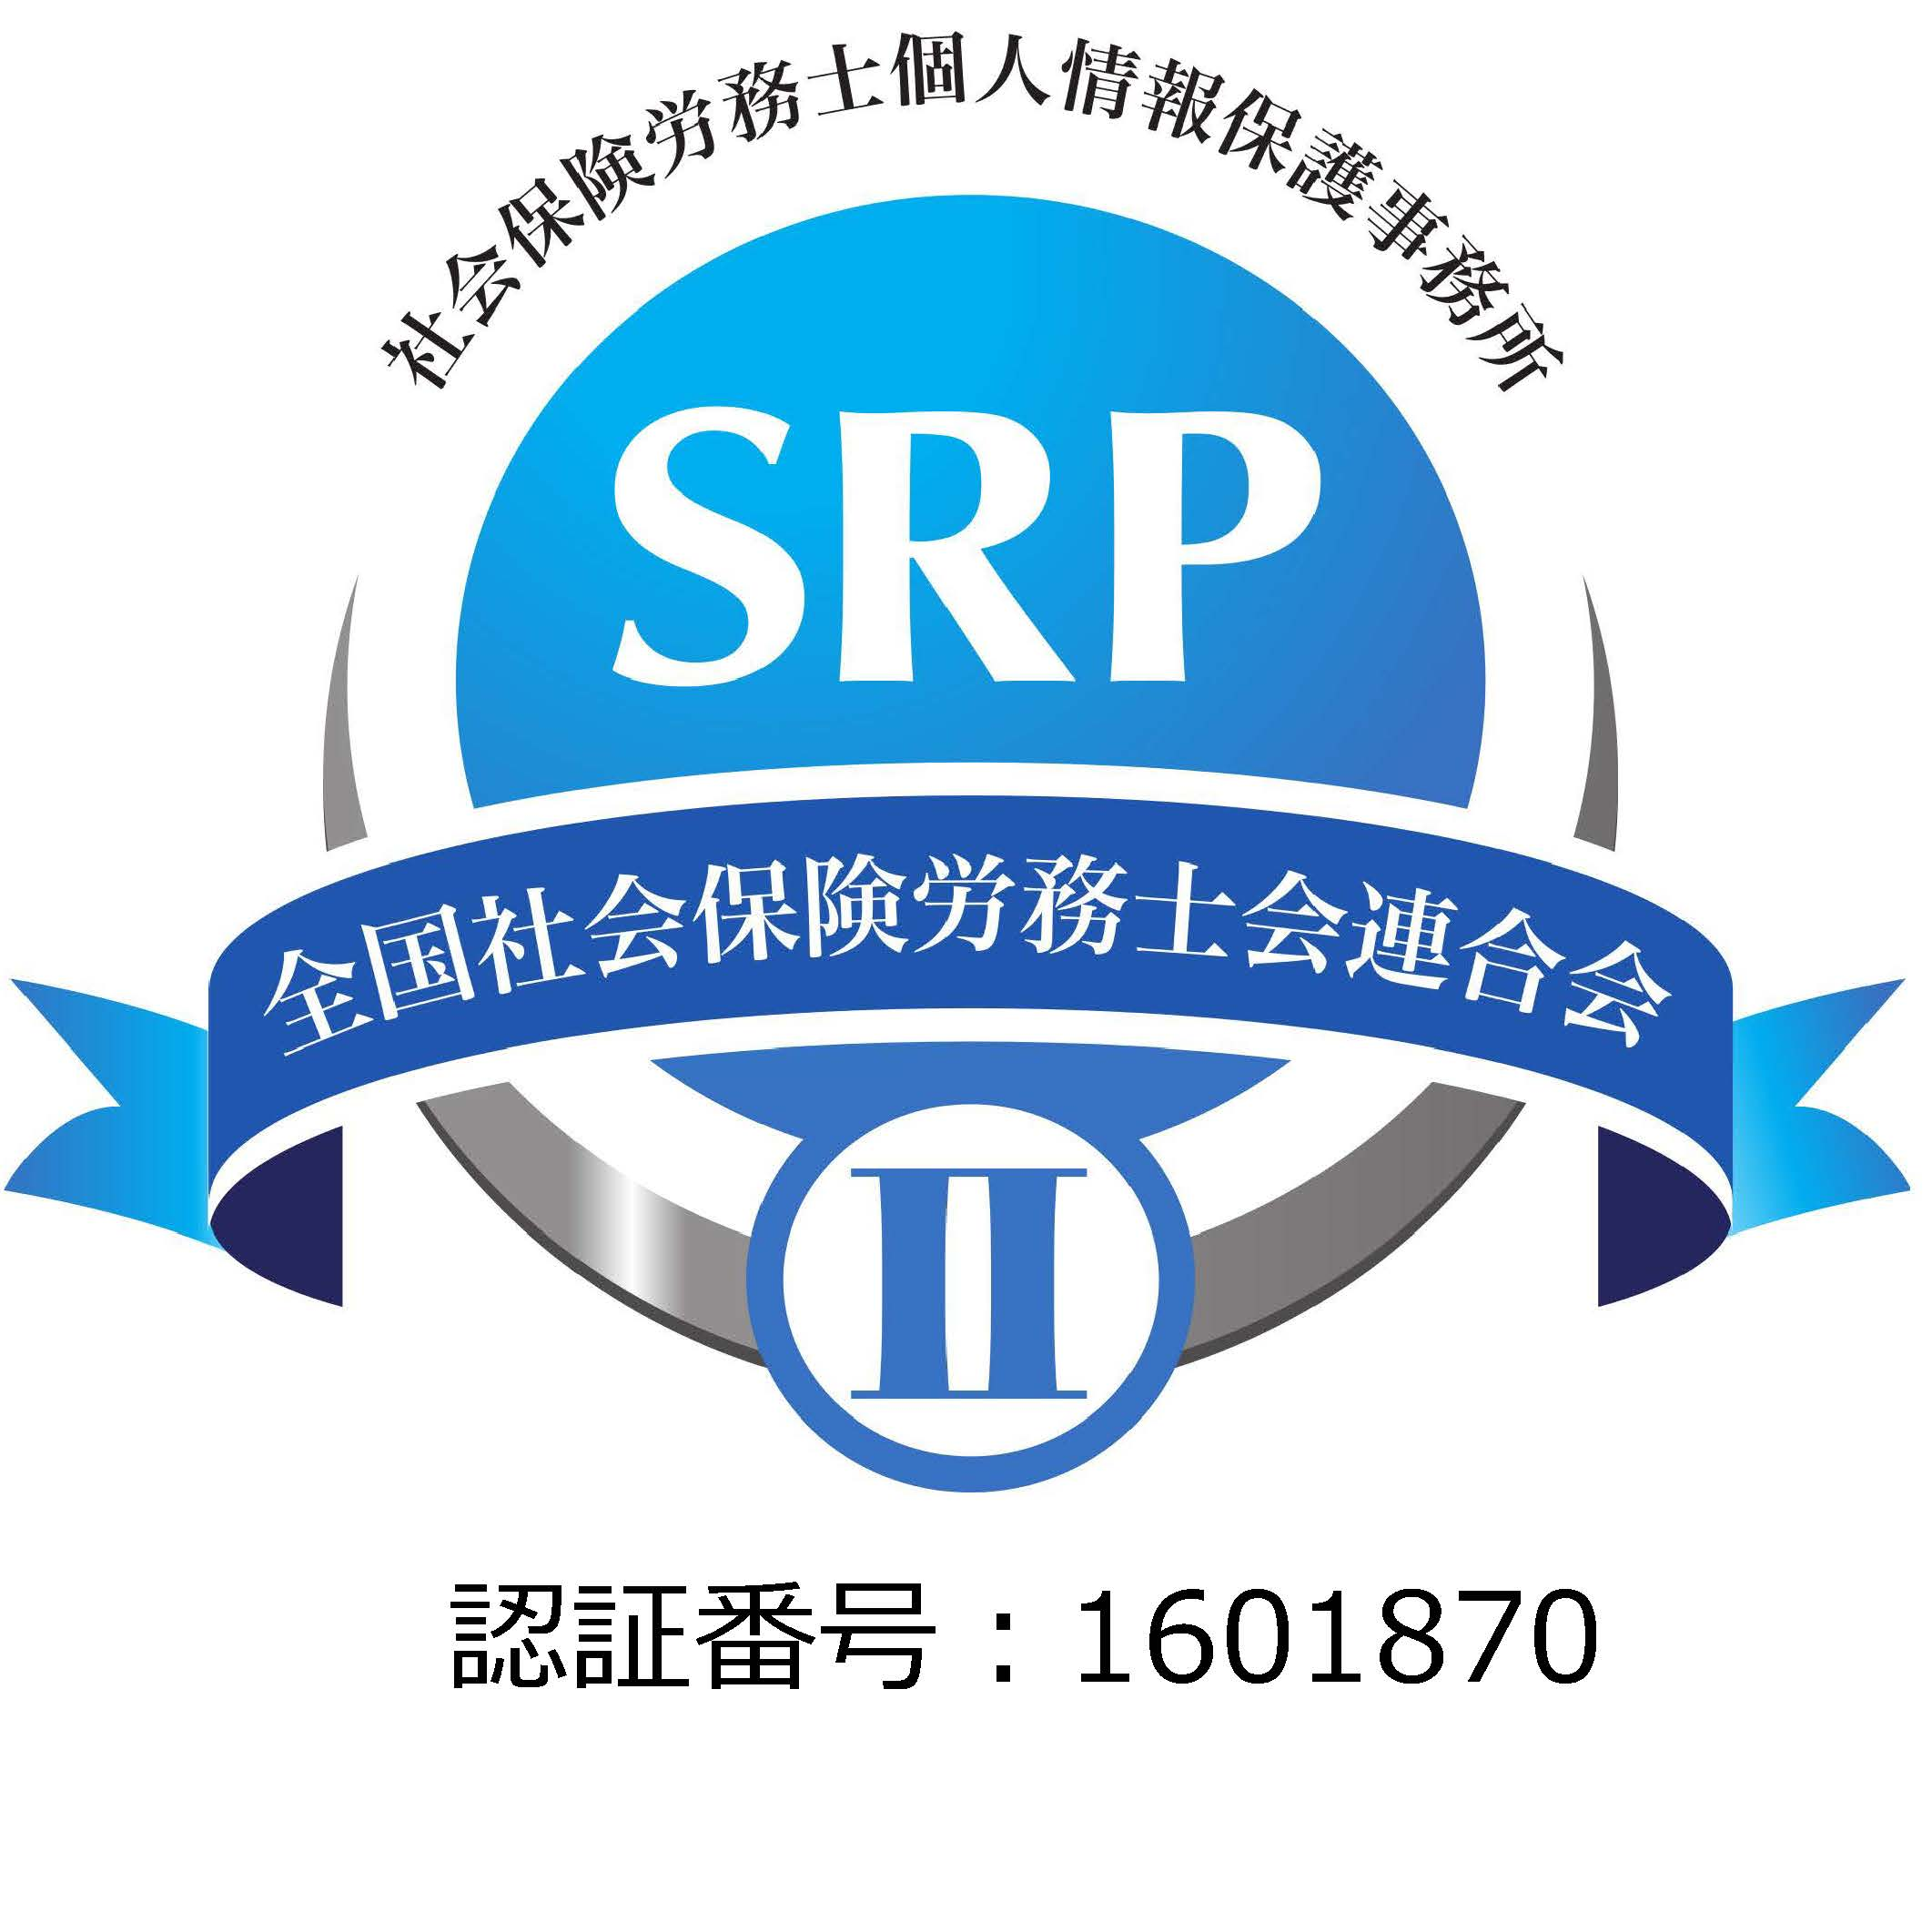 SRP2認証事務所